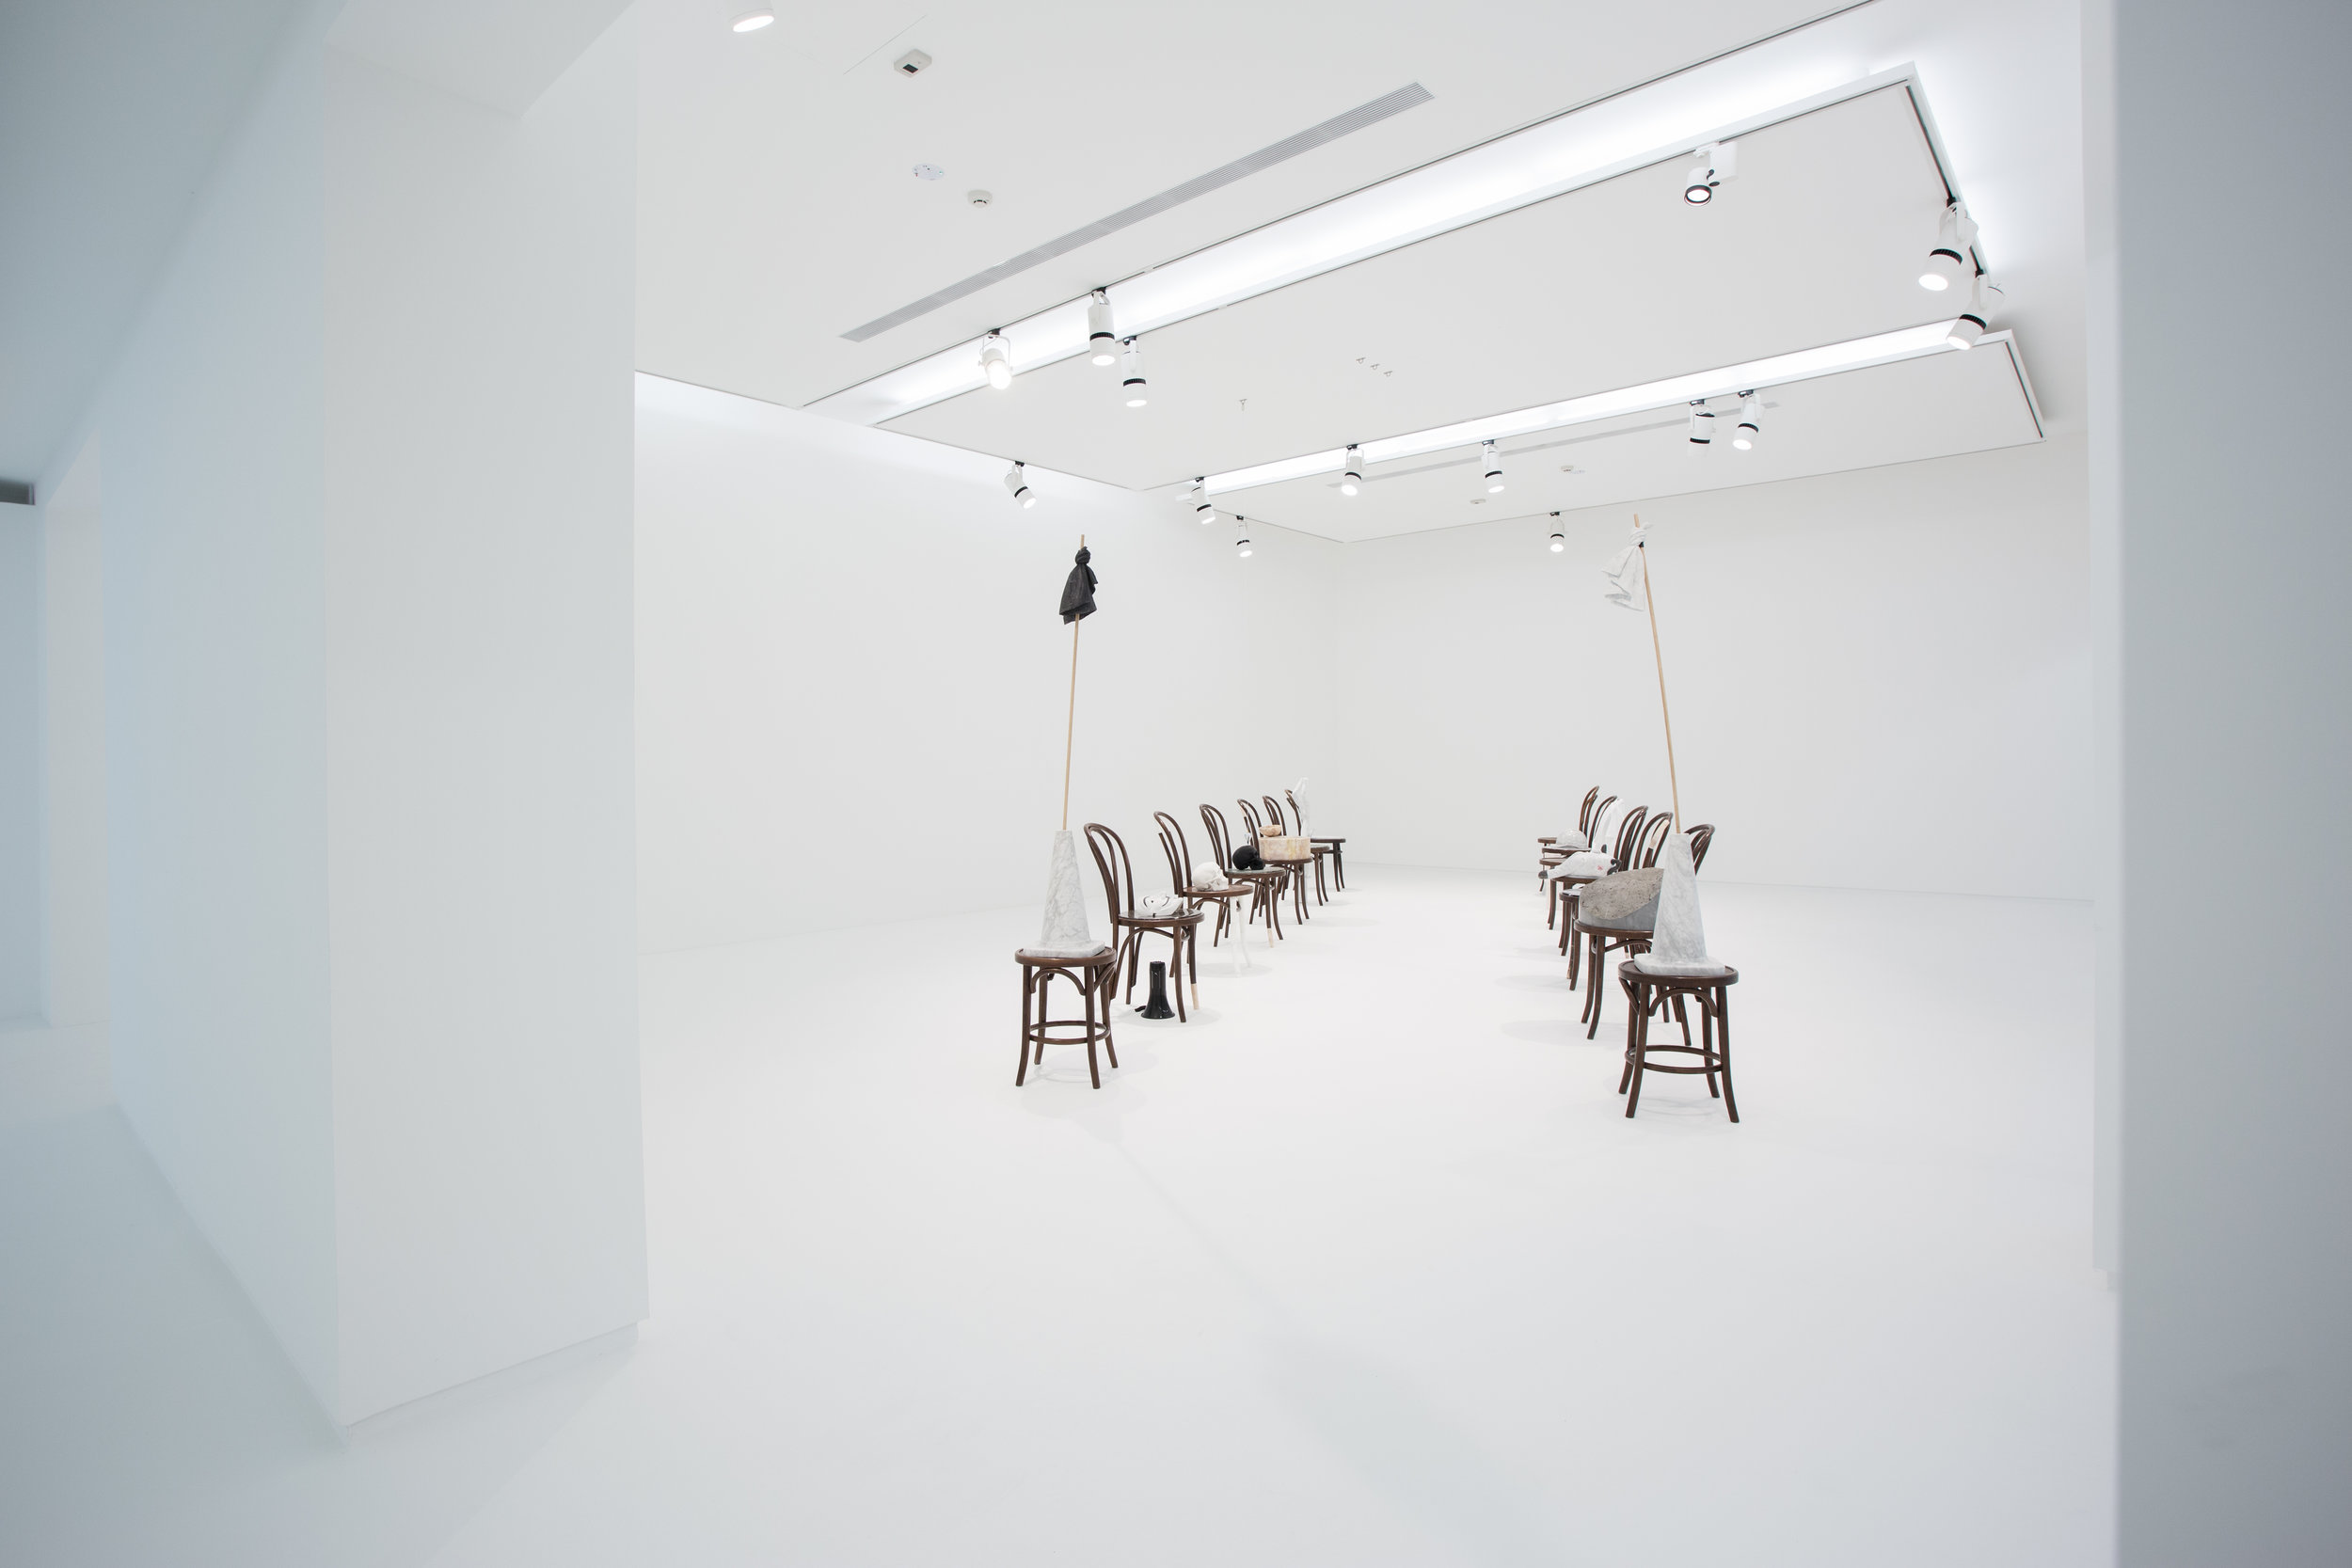 Pygmalion 28 October - 30 November 2016 Sullivan+Strumpf, Singapore   Installation view